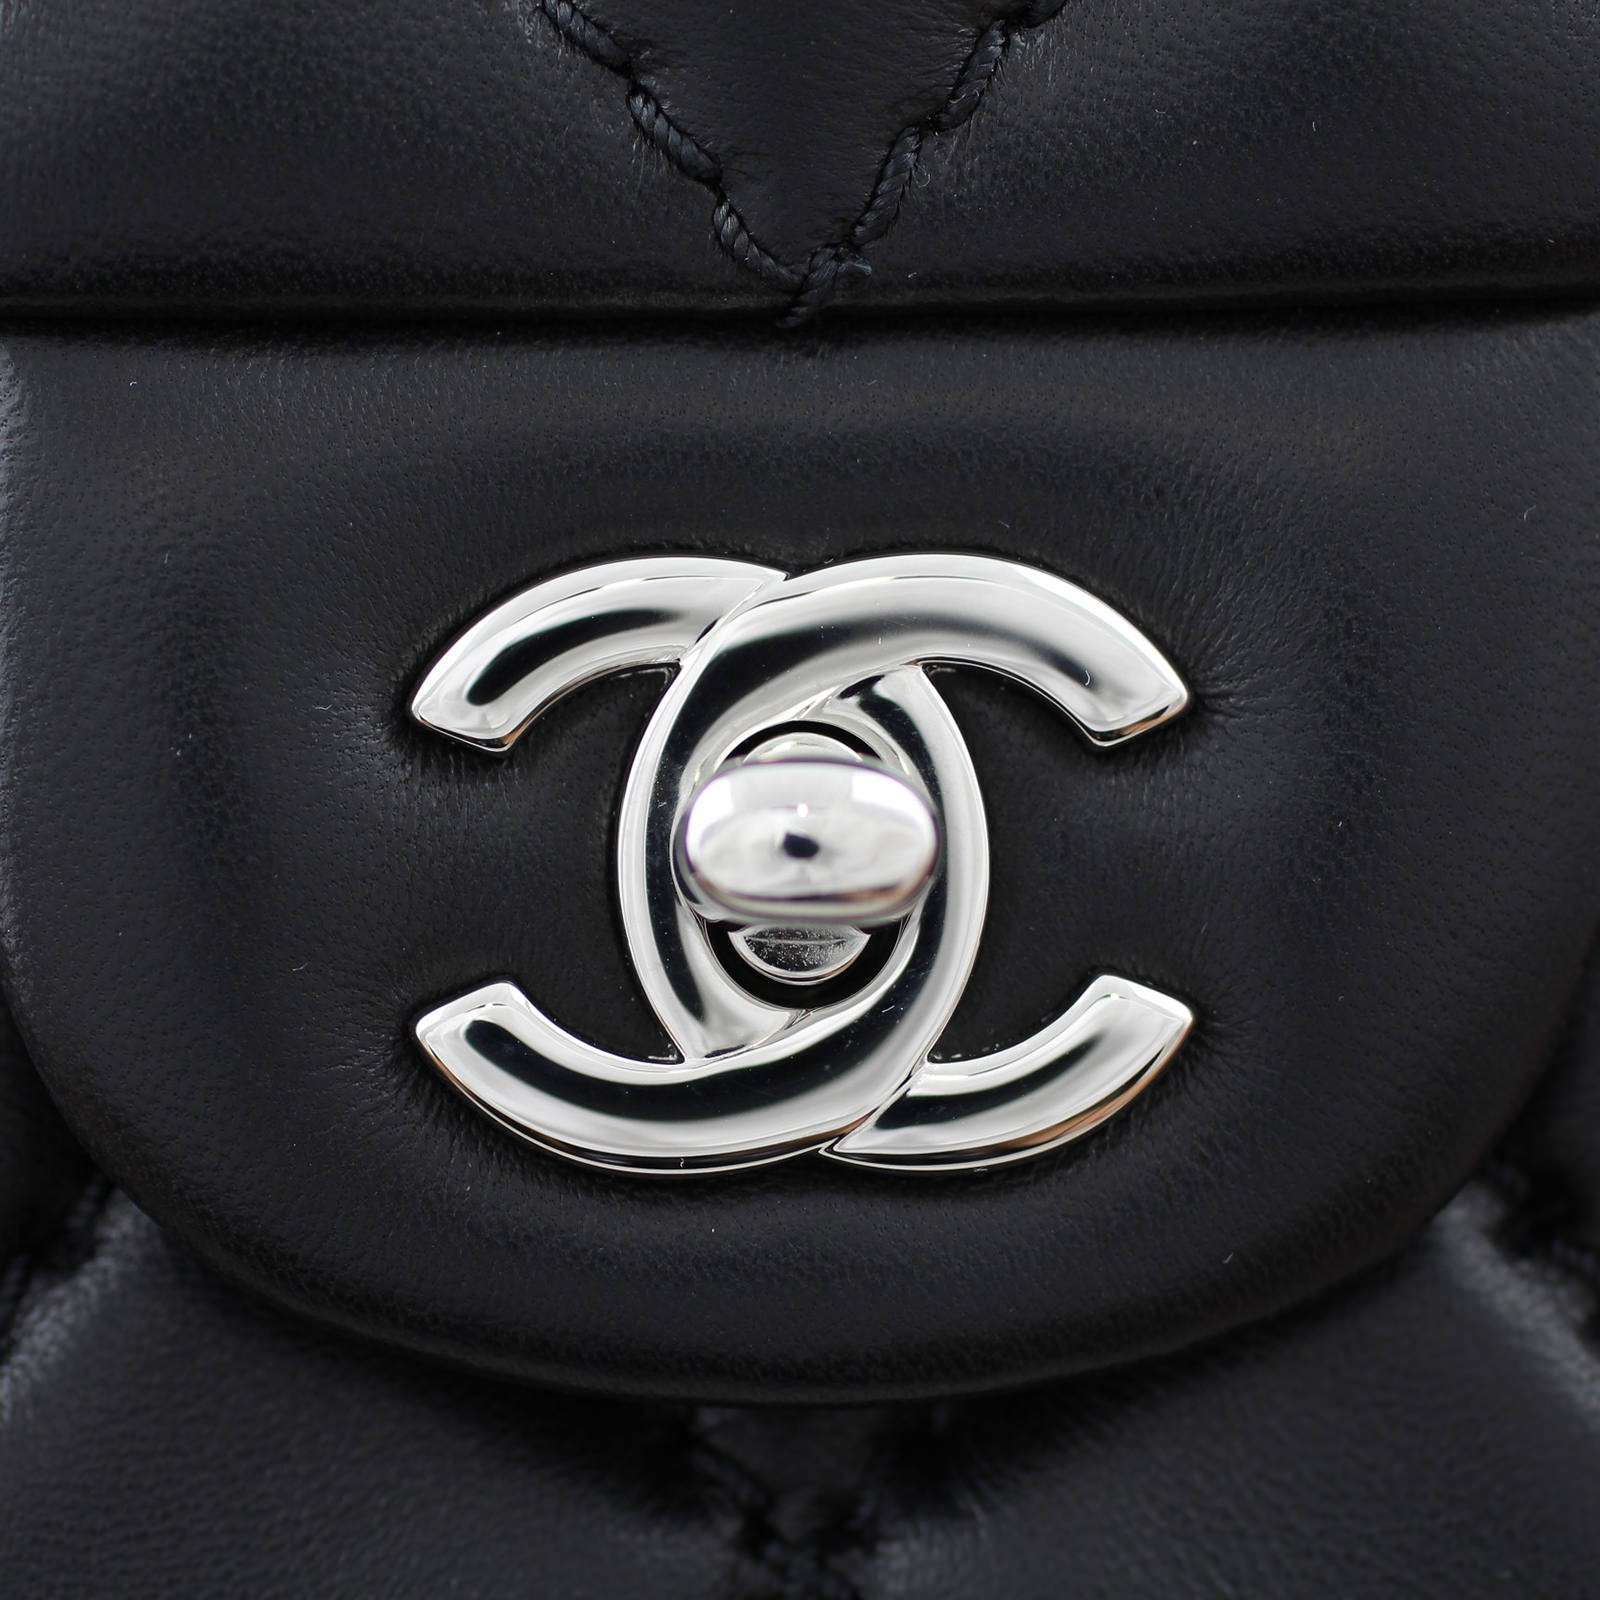 CHANEL EASY CARRY MEDIUM FLAP BAG